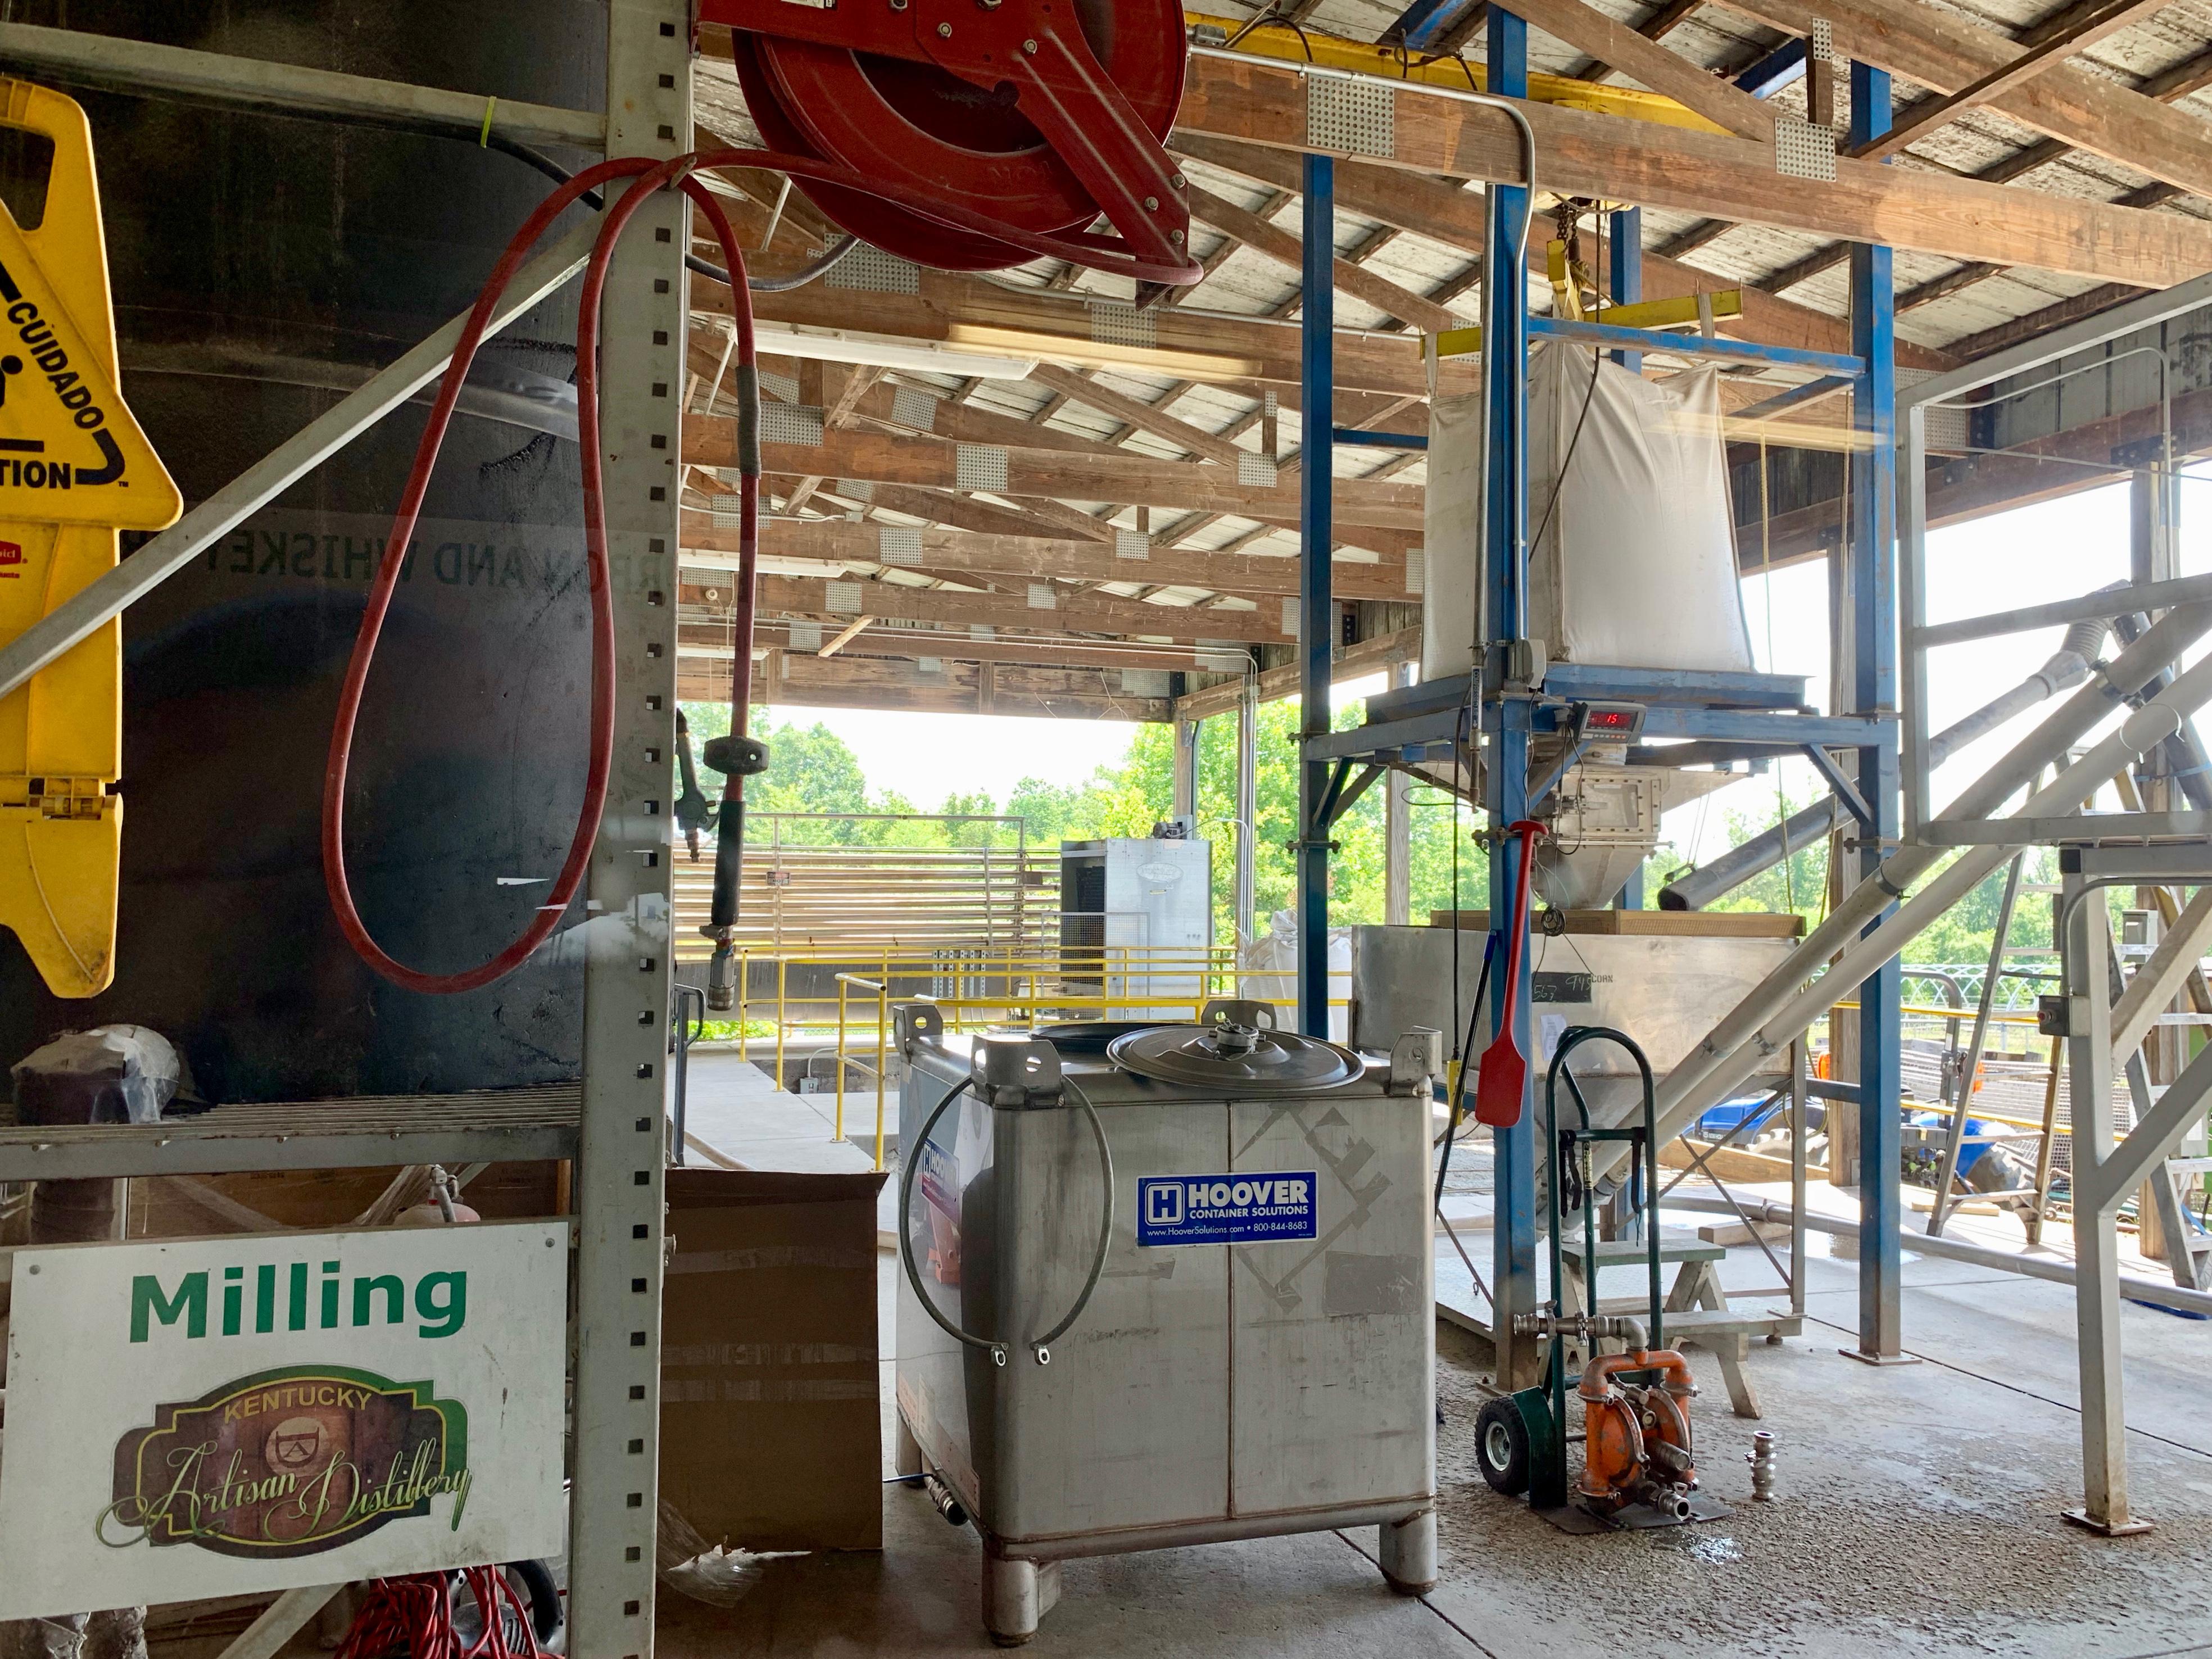 Milling Area - Kentucky Artisan Distillery